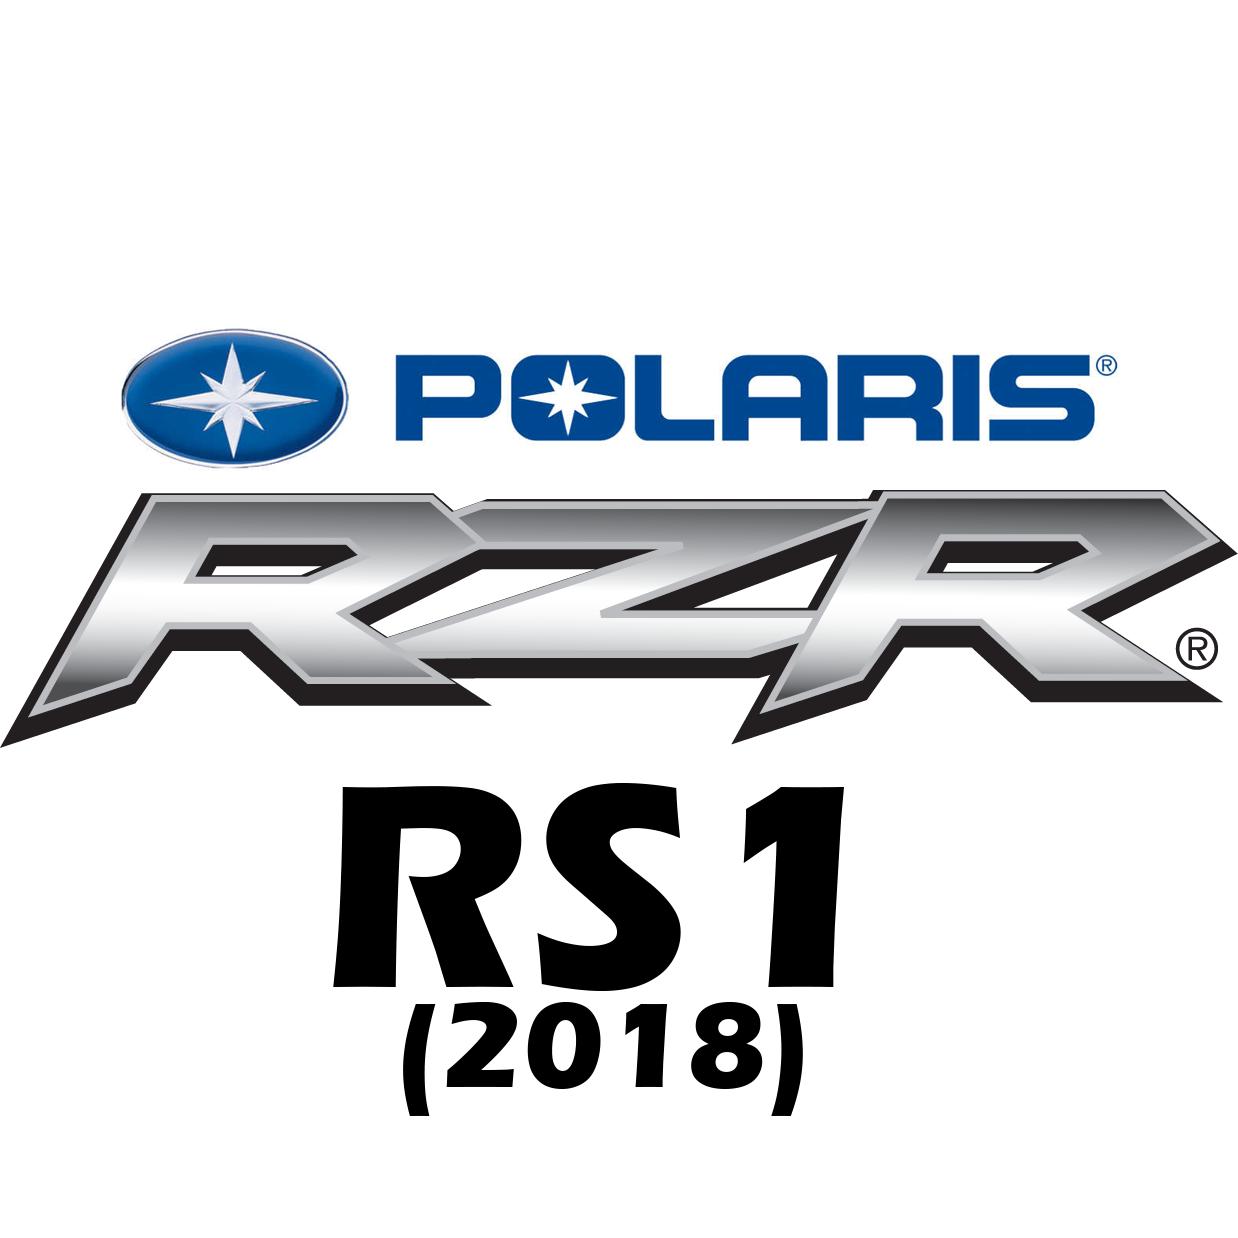 Polaris RS1 (2018)